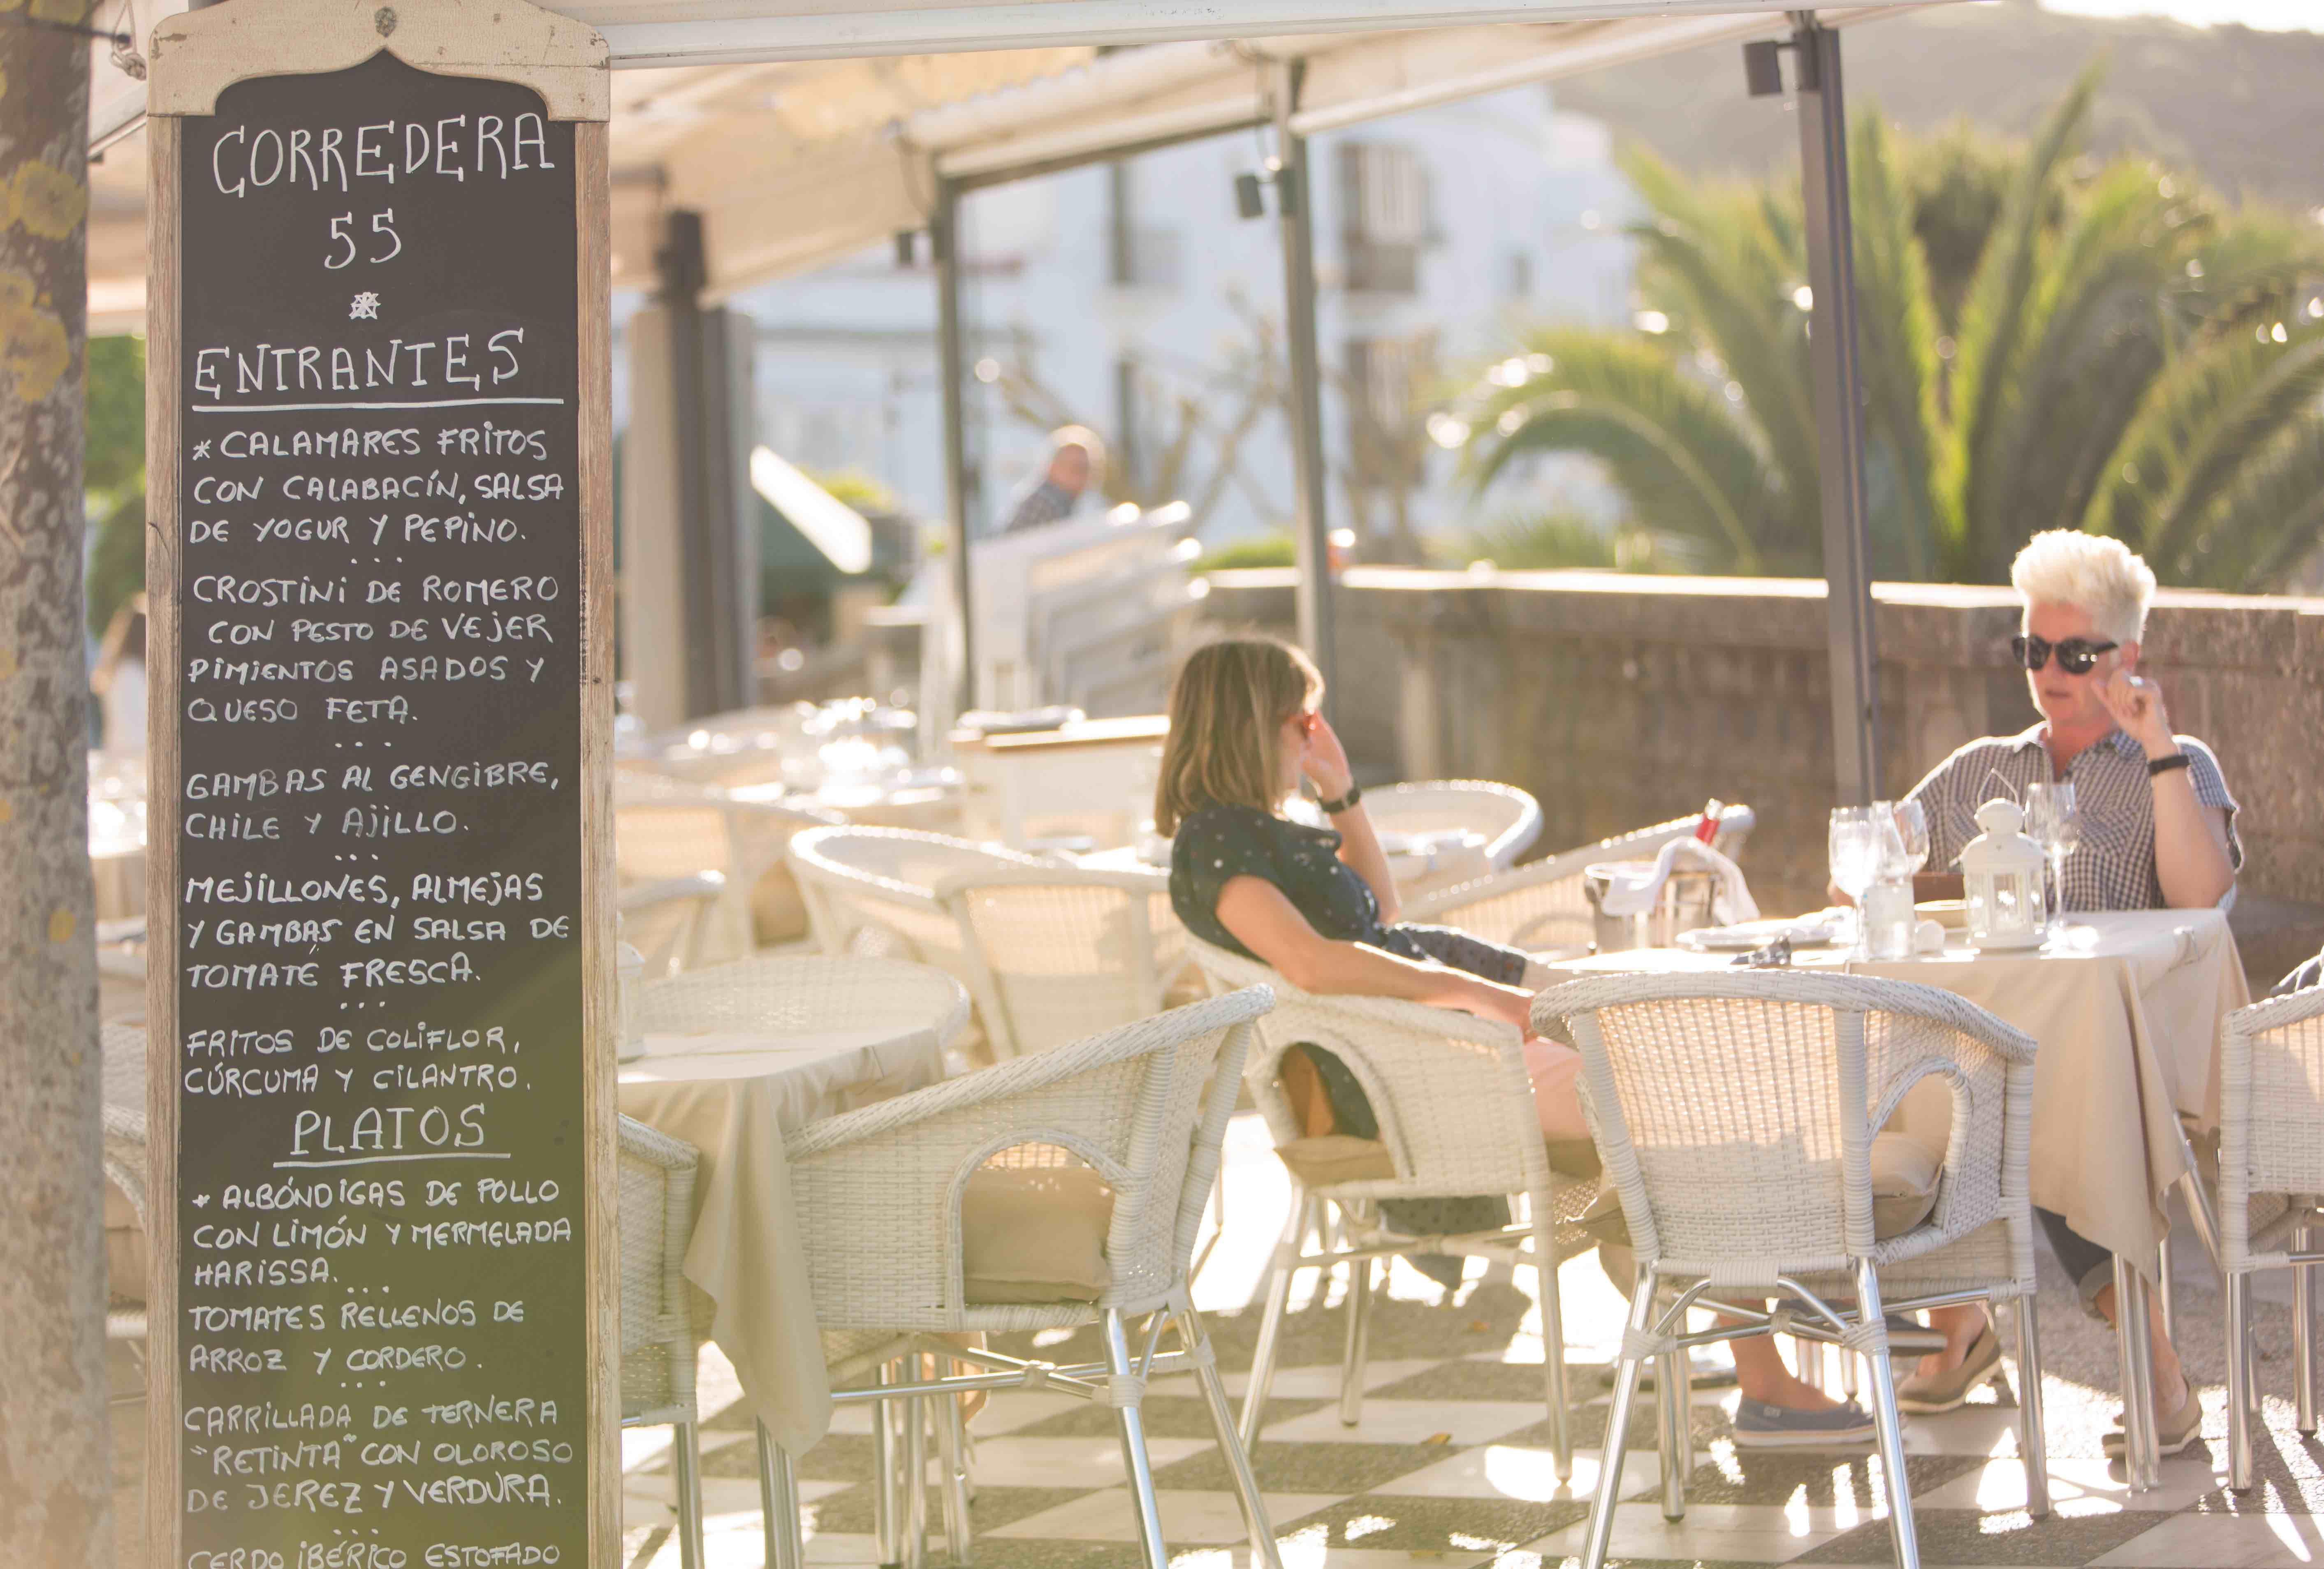 Corredera 55 Terraza Vejer Restaurants Outdoor Furniture